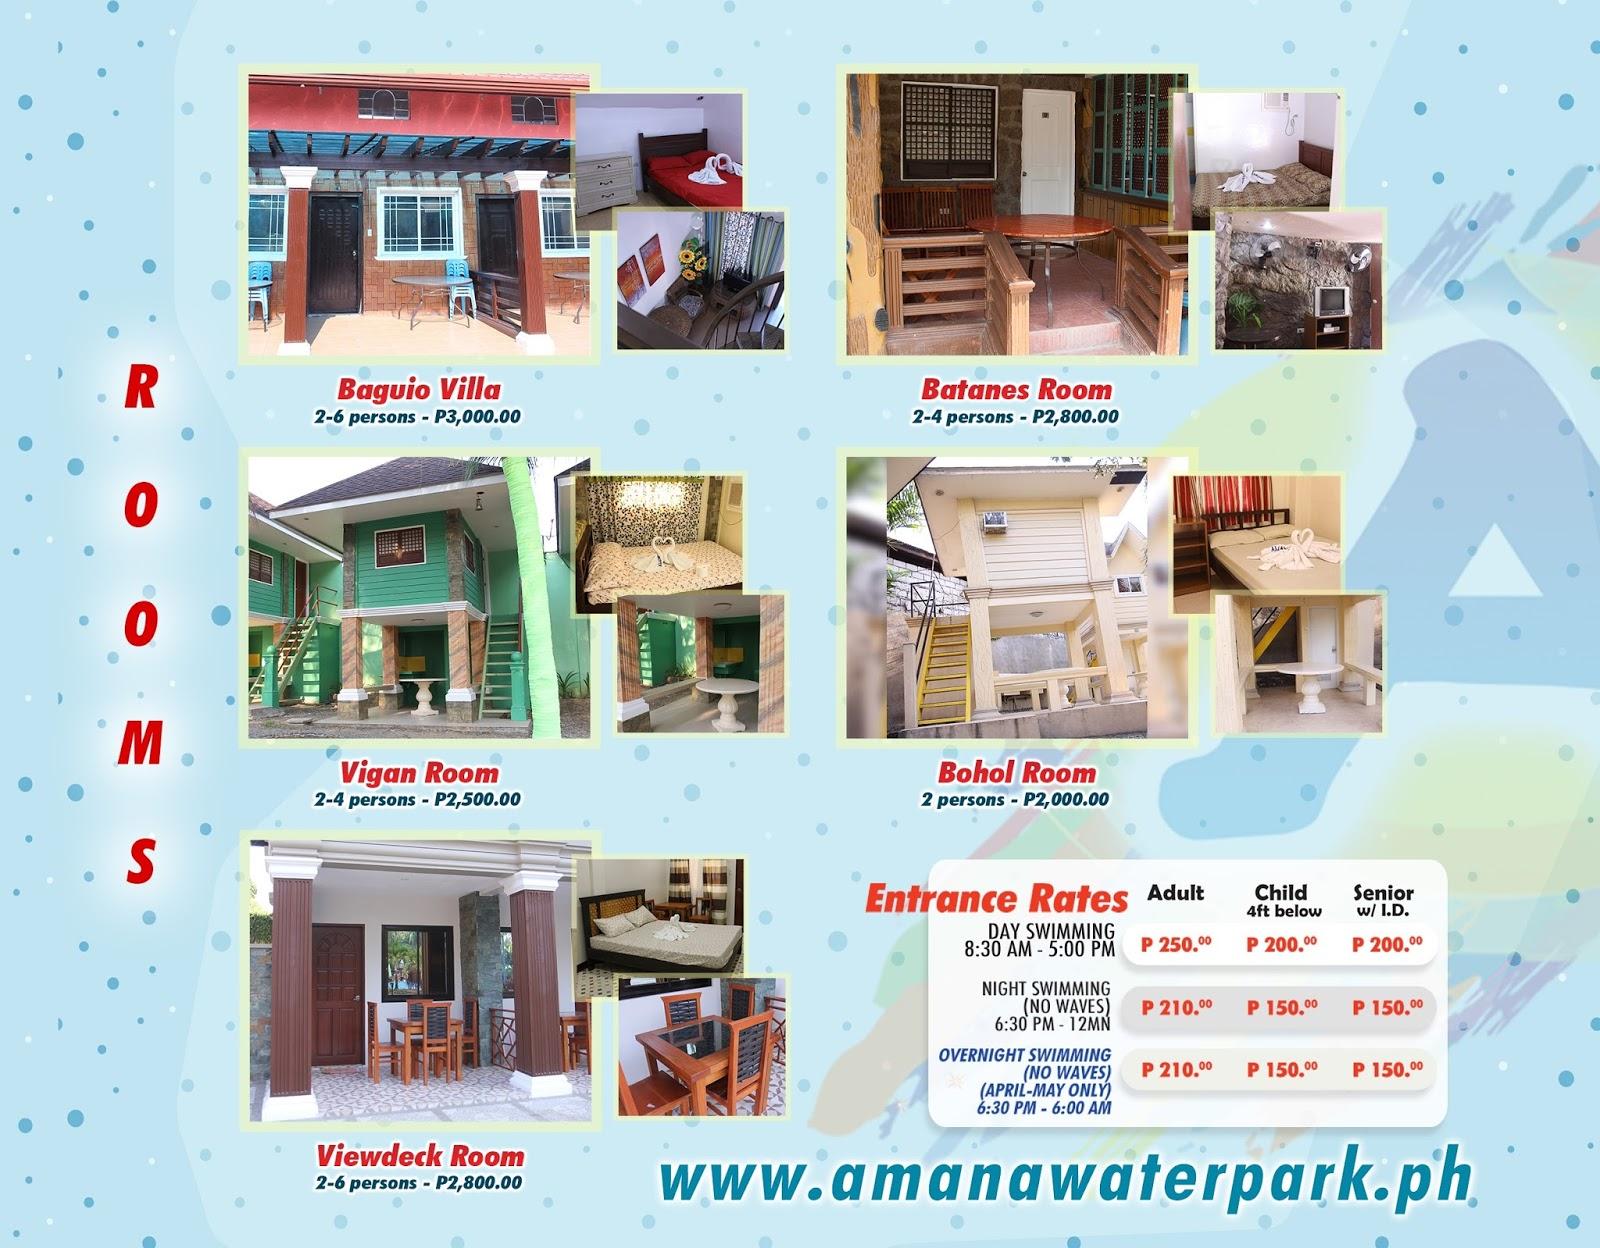 Affordable But Awesome Summer Destination Near Manila